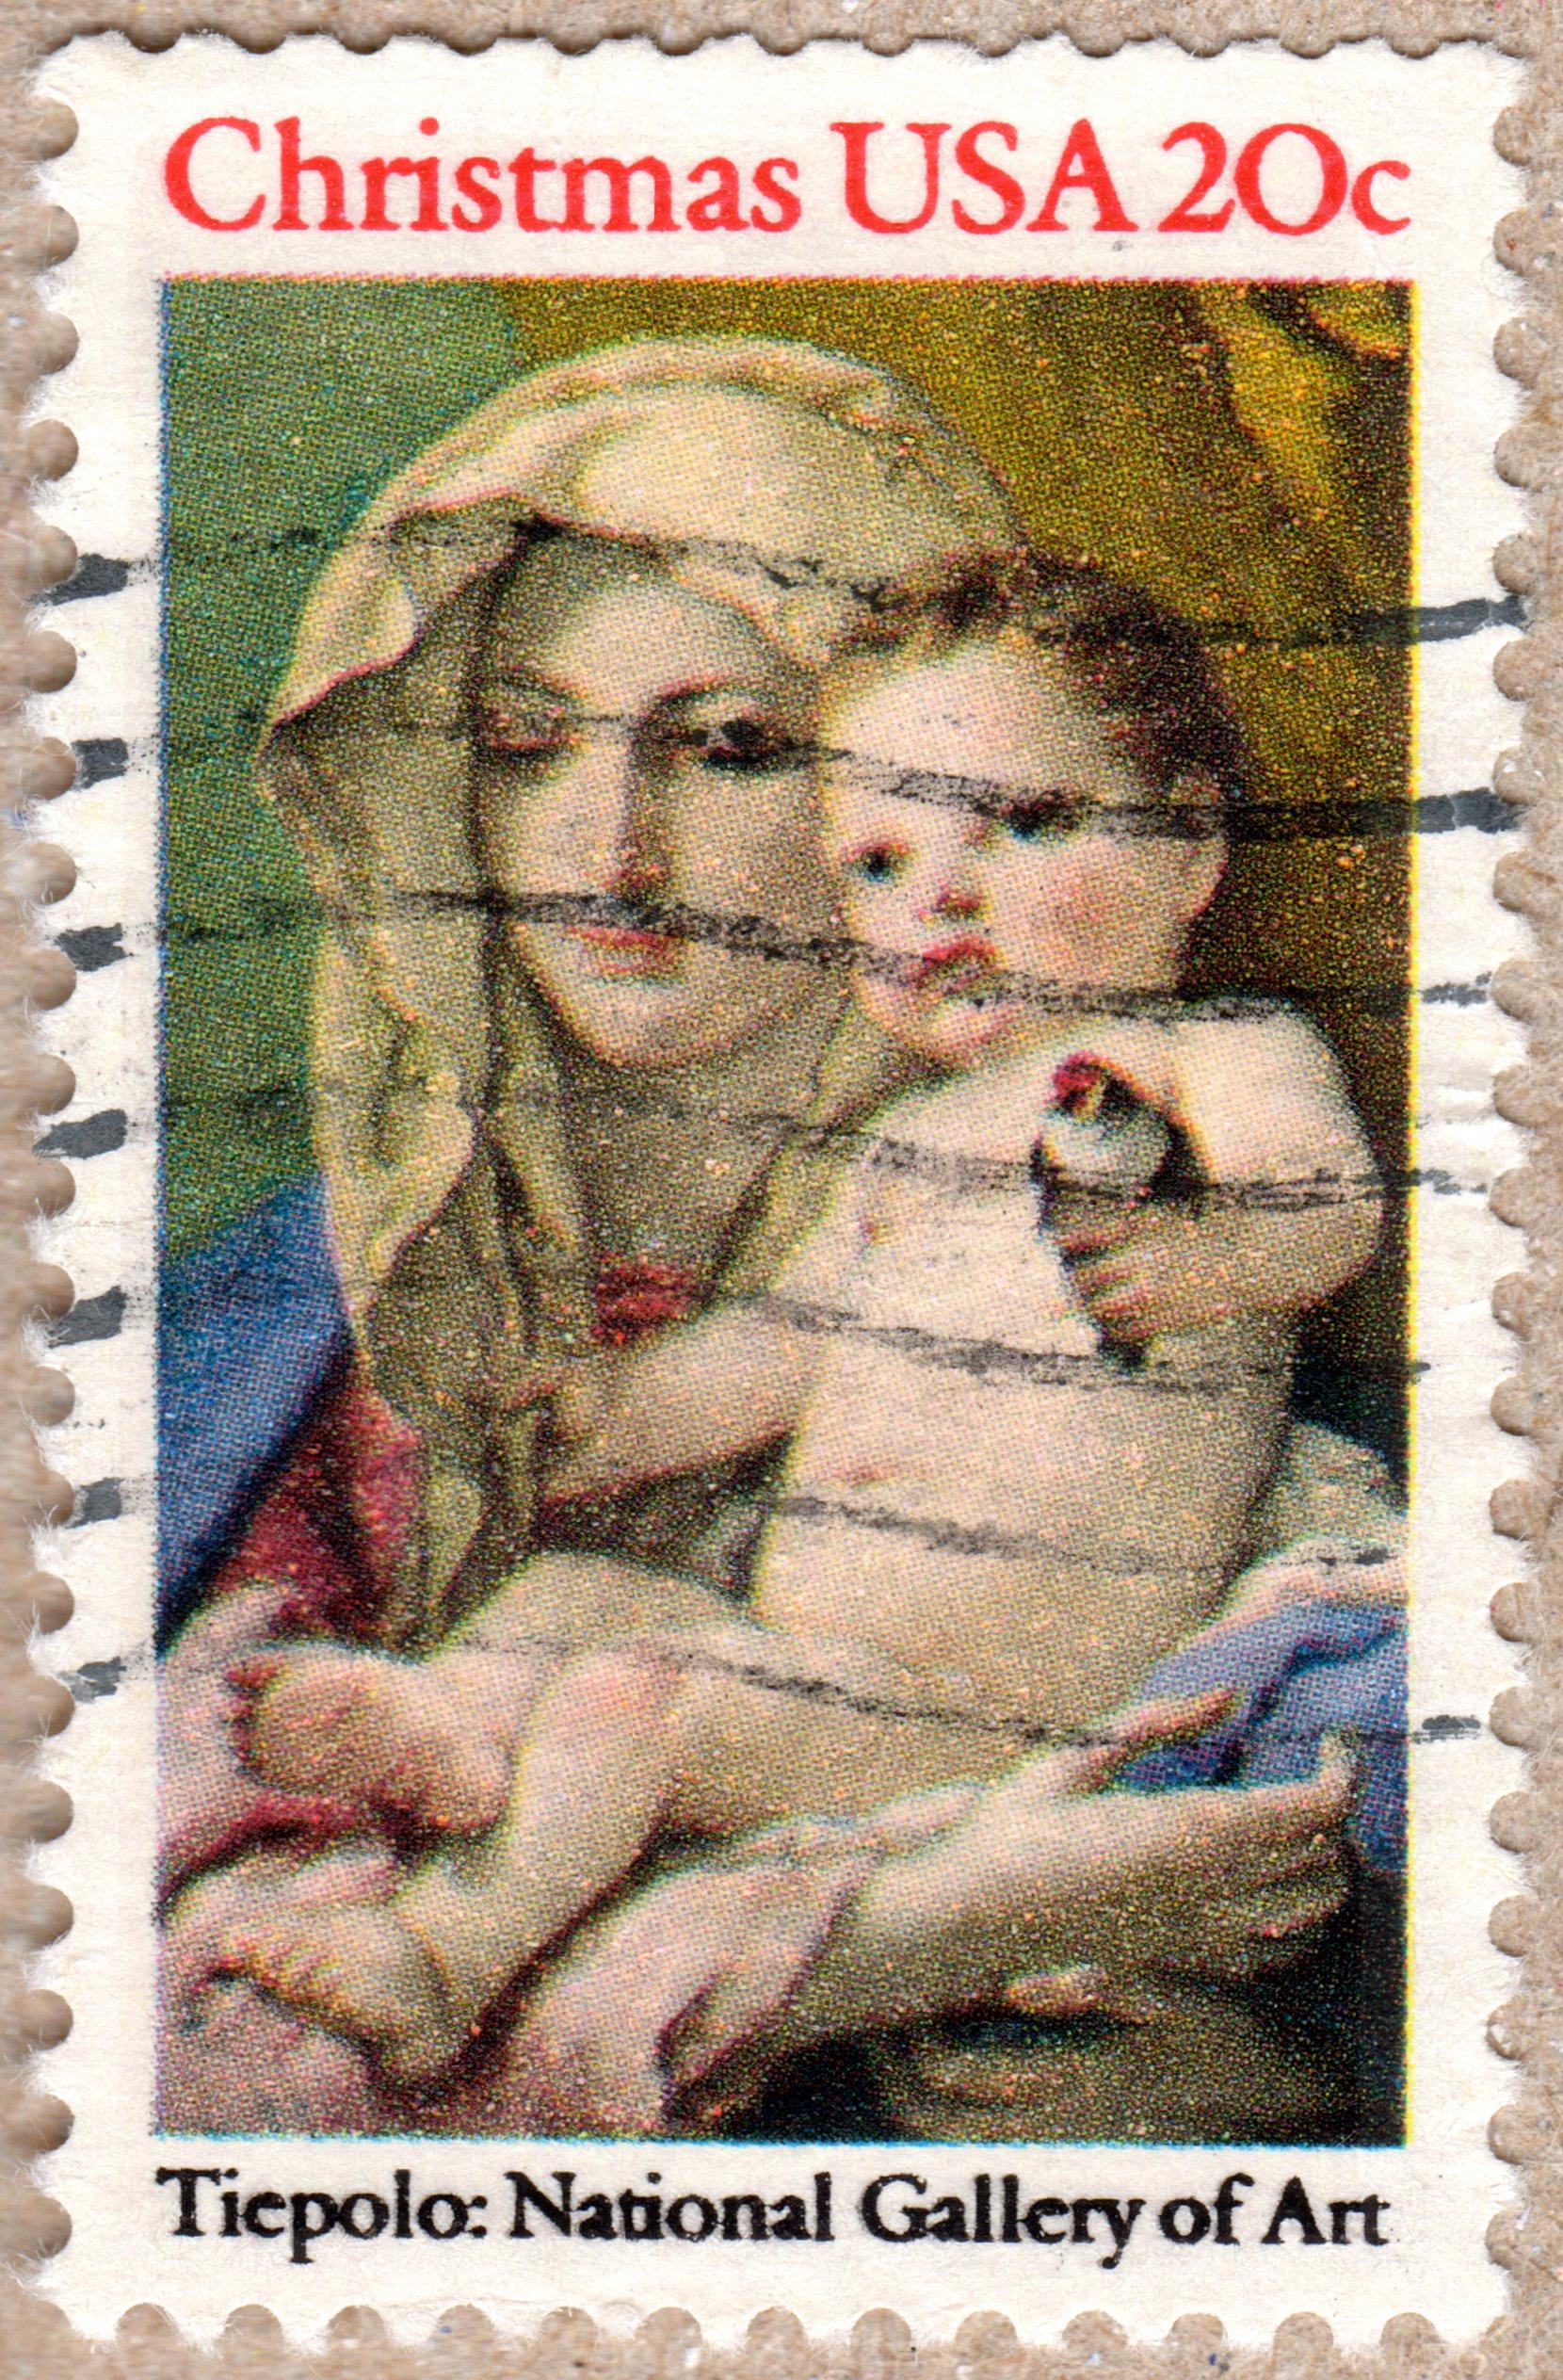 christmas usa 20¢ philately postage stamps